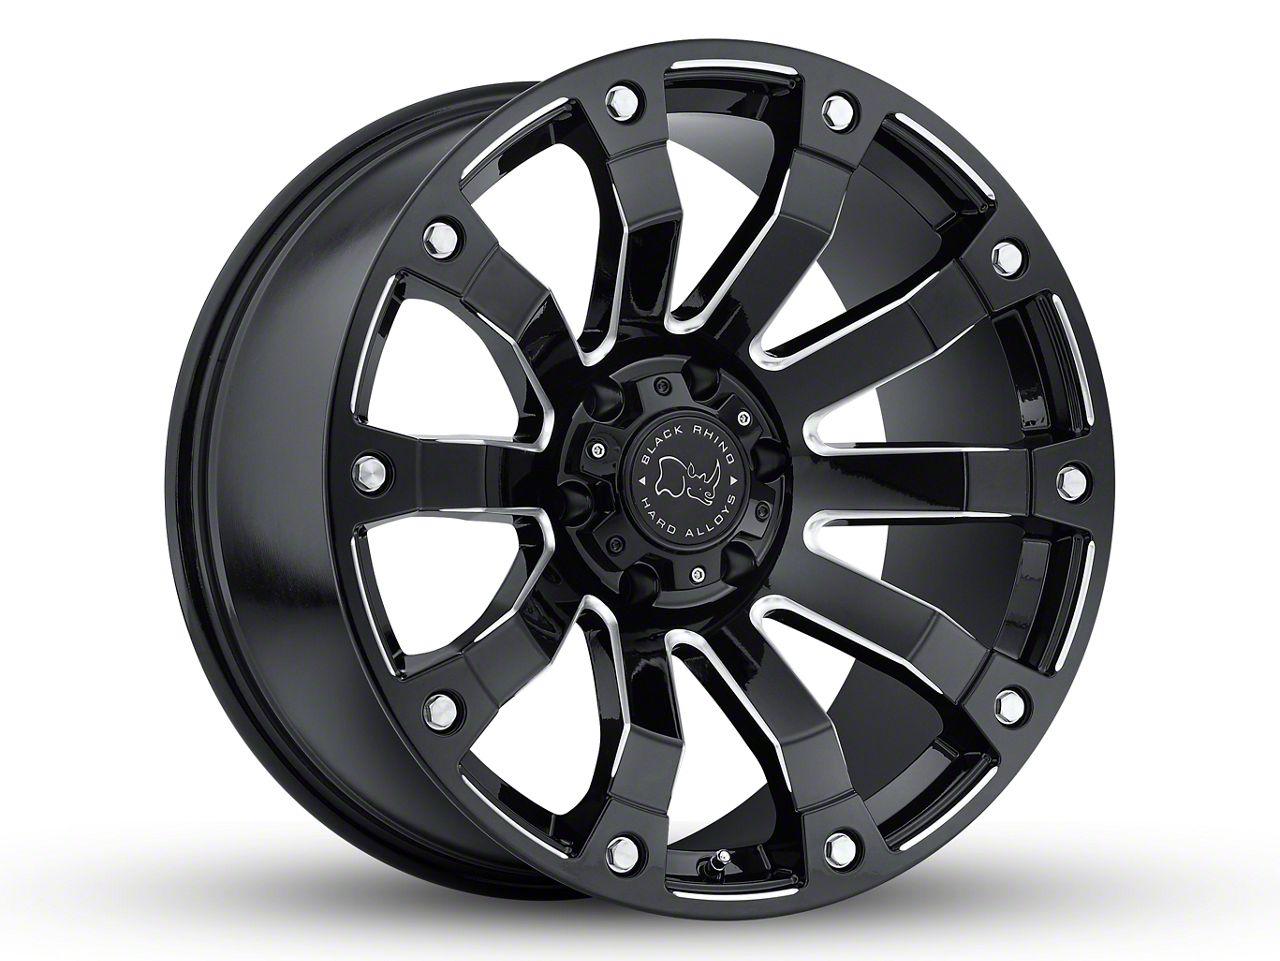 Black Rhino Selkirk Gloss Black Milled 5-Lug Wheel - 20x9 (02-18 RAM 1500, Excluding Mega Cab)